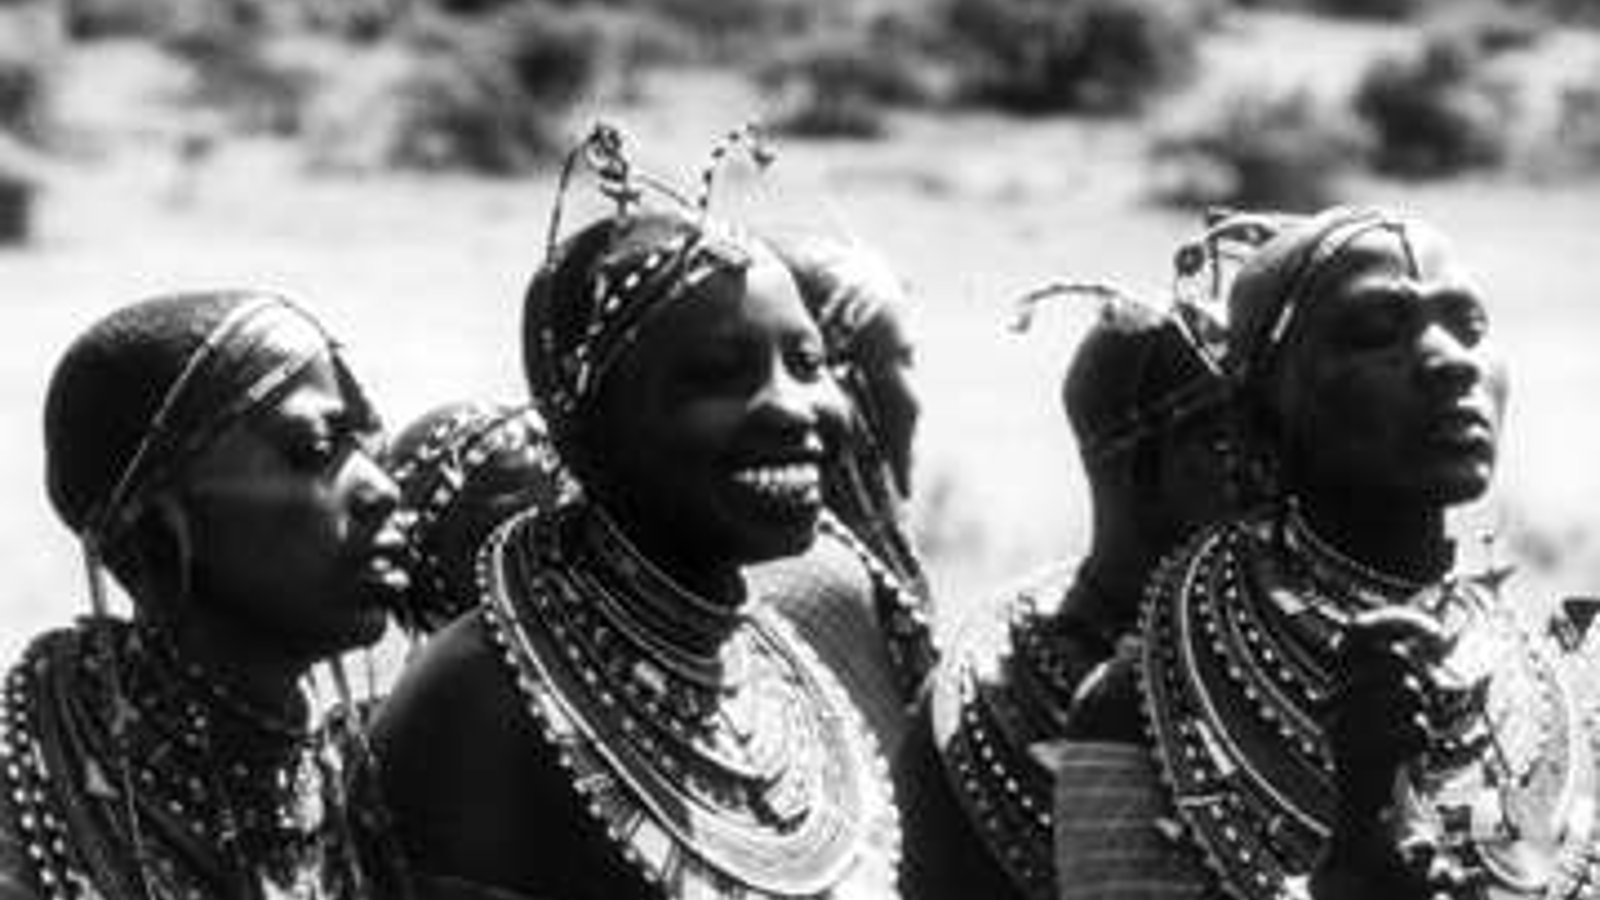 The Women's Olamal - The Organization of a Maasai Fertility Ceremony